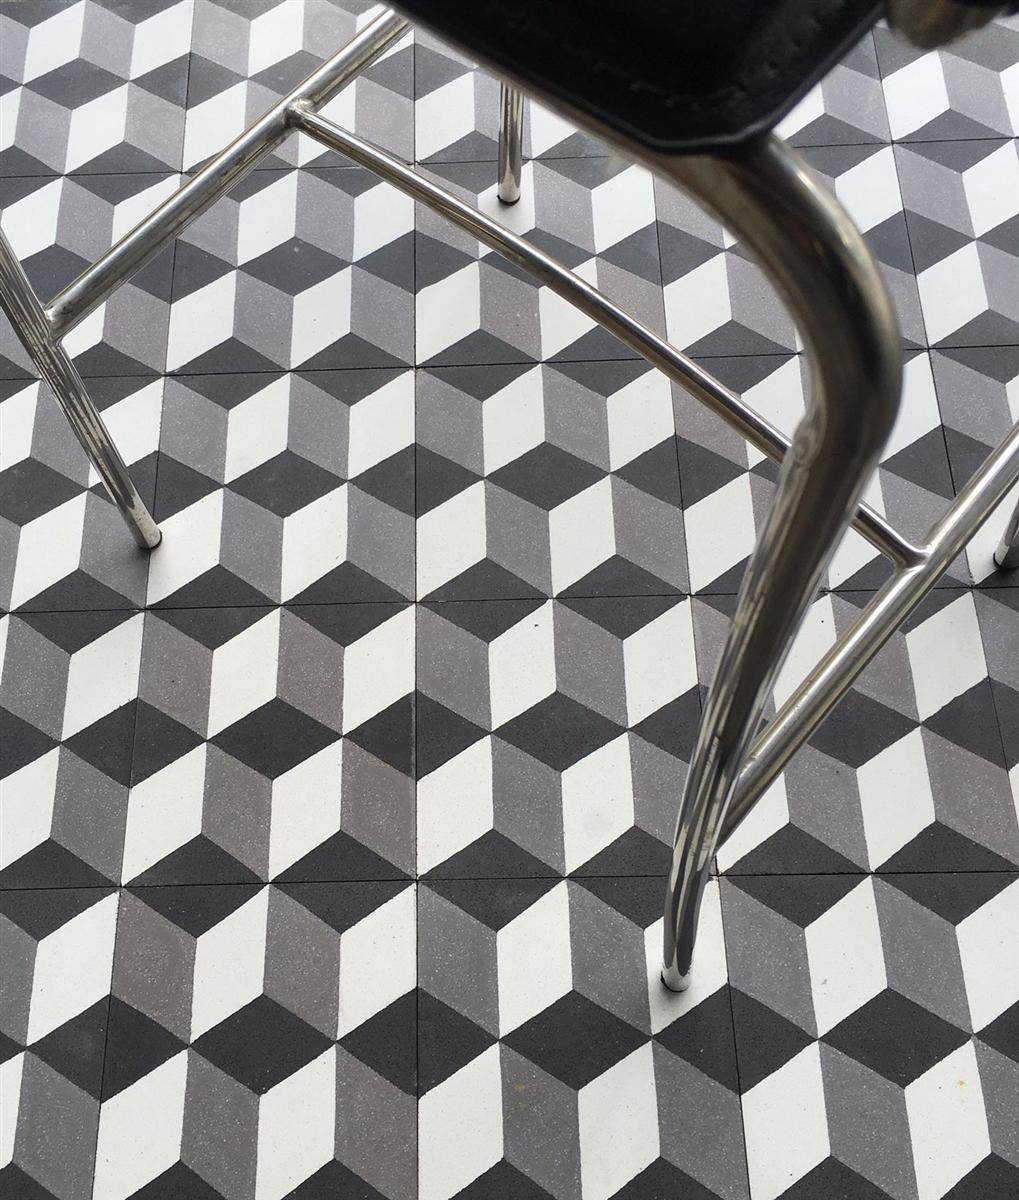 8x8 hexagonal 3 dimensional encaustic cement tile floor